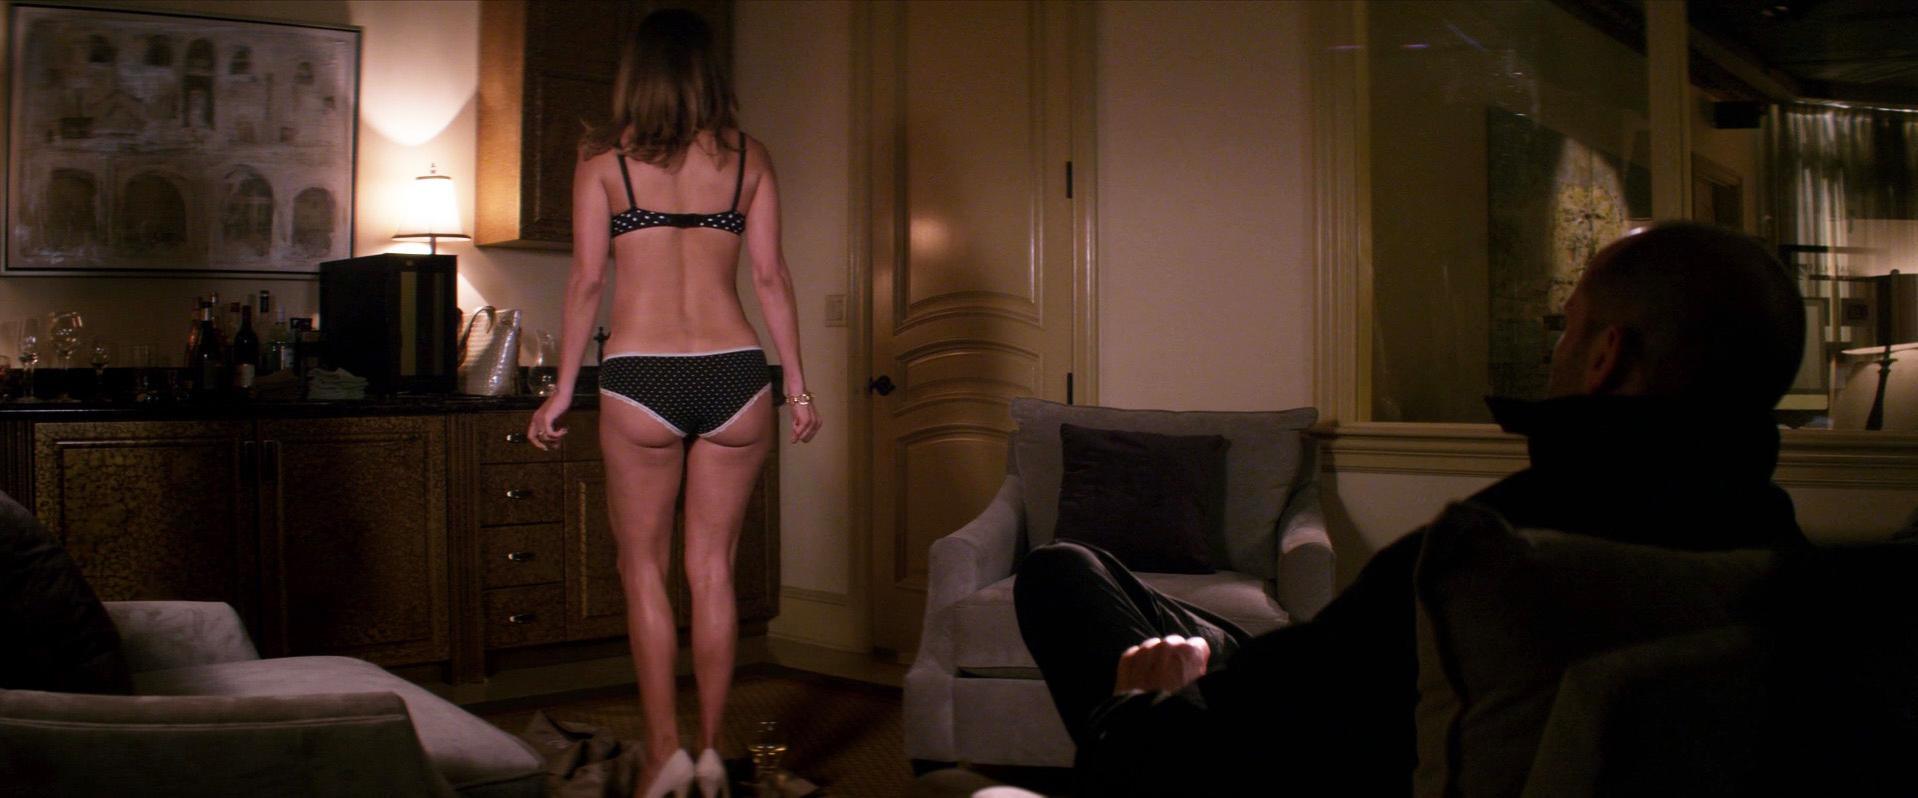 Fransiz erotik film